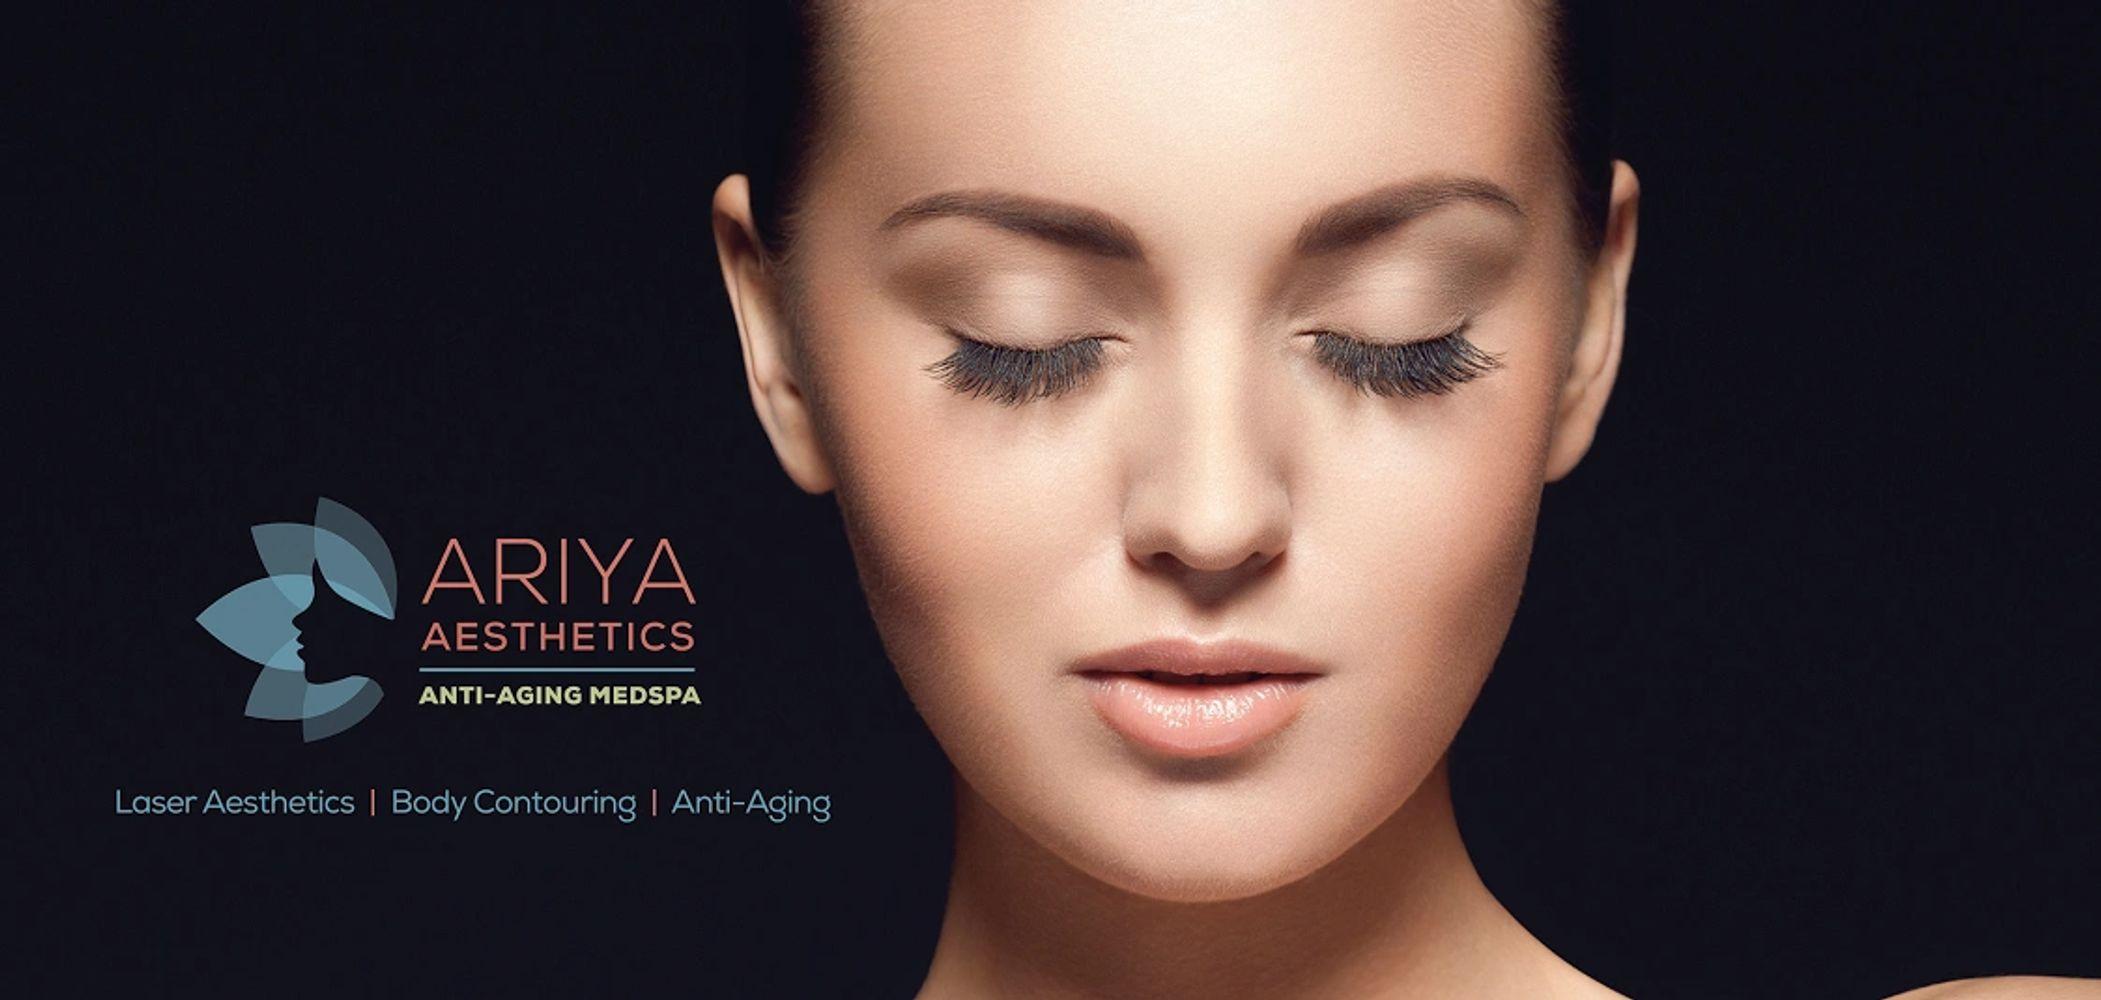 Coolsculpting Laser Hair Botox Fillers Facials Ariya Aesthetics